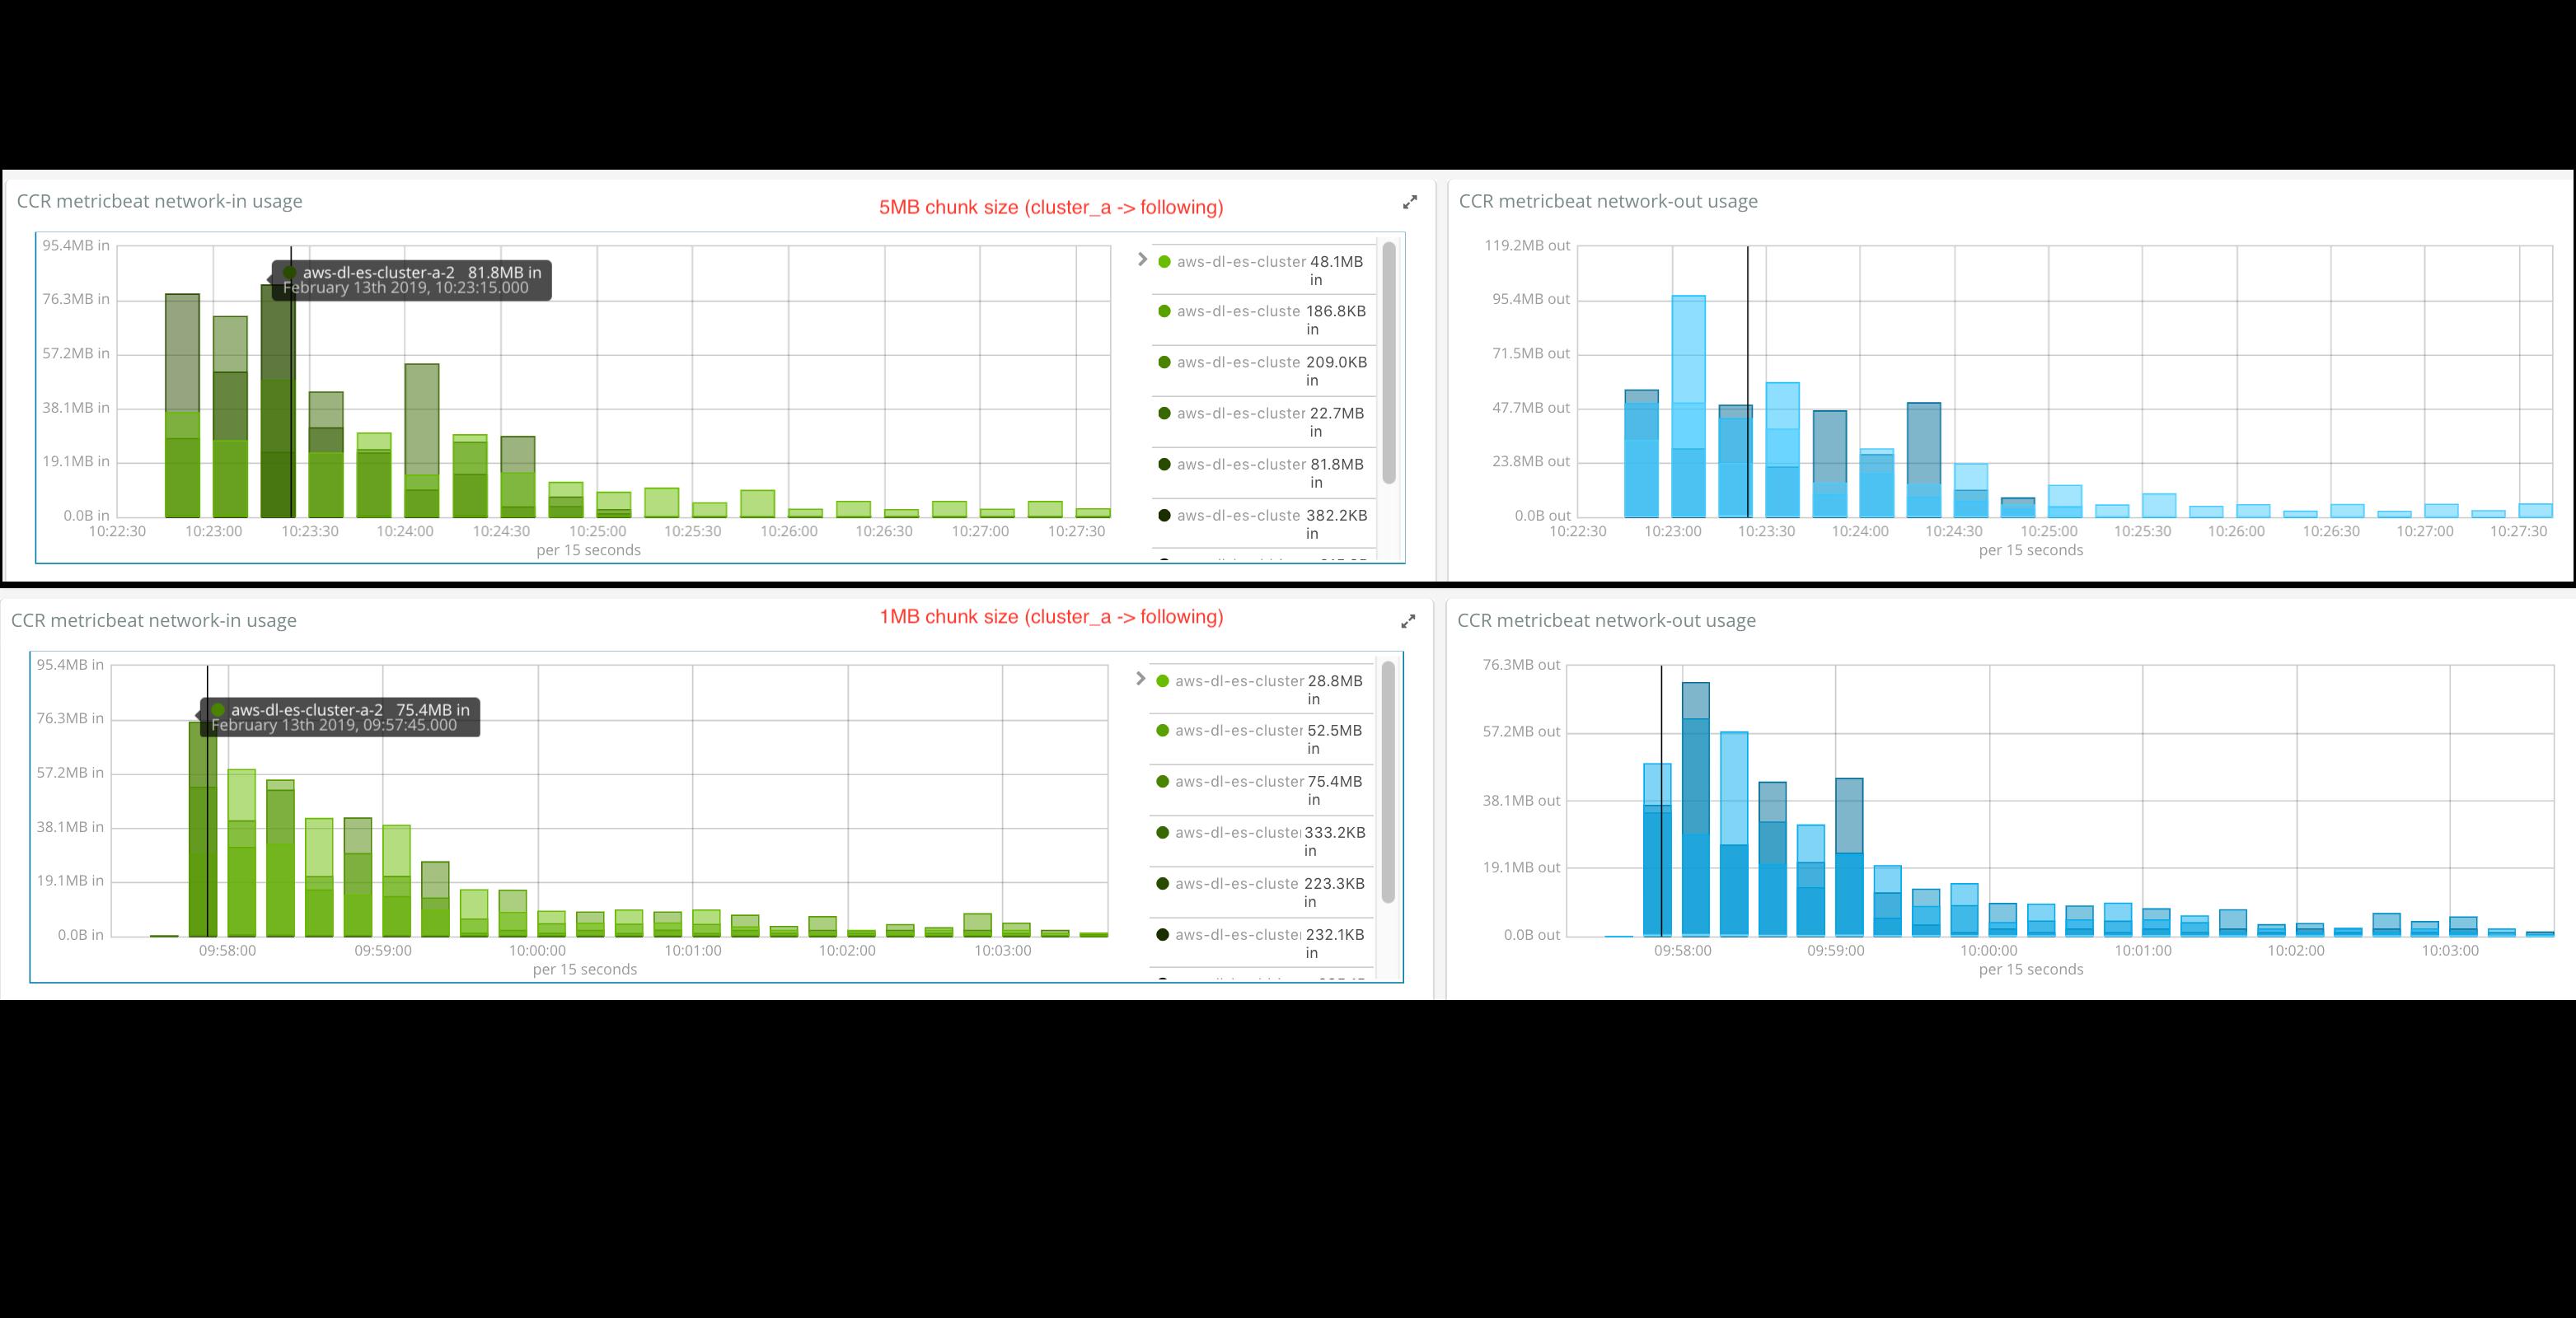 httplogs_5mb_vs_1mb_baseline_comparison_network